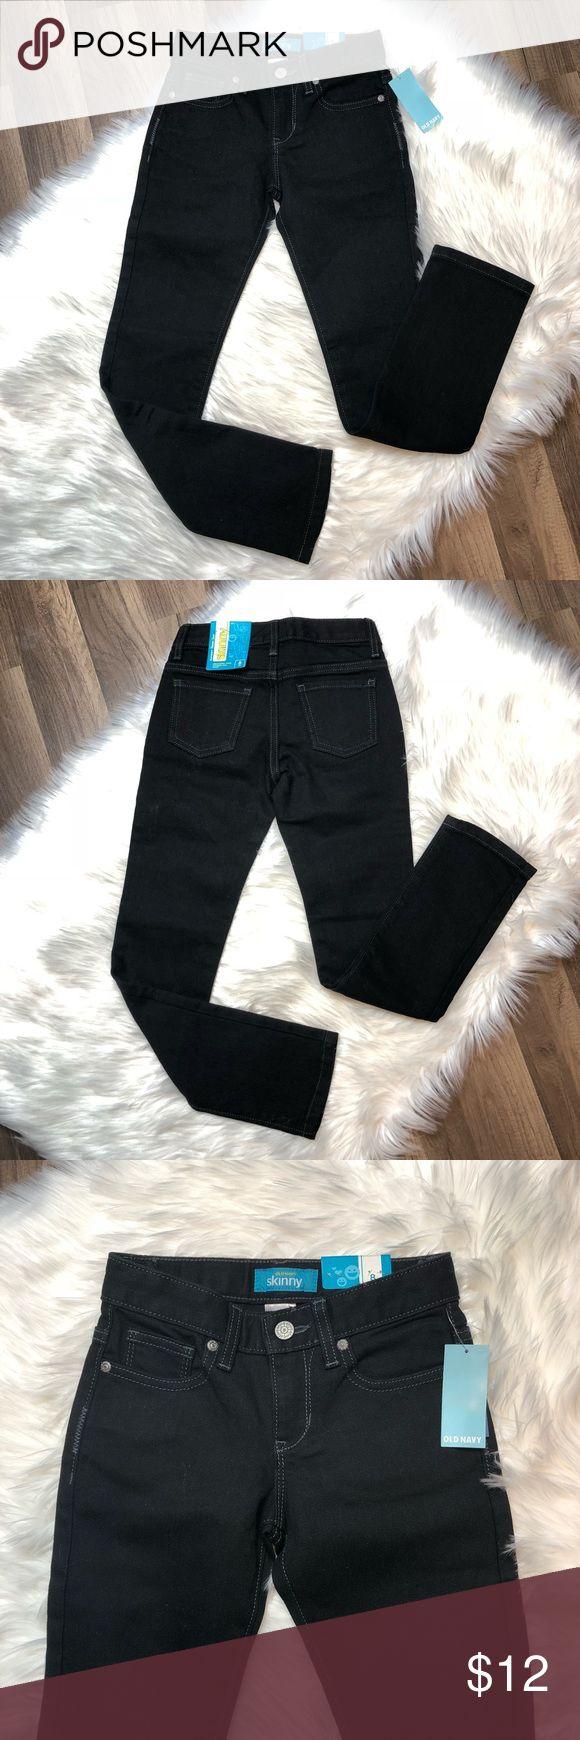 Girls Size 8 Old Navy Skinny Jeans New• Girls Skinny jeans• Black• Adjustable waist•  67% Cotton• 32% Polyester•  1% Lycra• 🚫NO Trade/PP🚫 Old Navy Bottoms Jeans